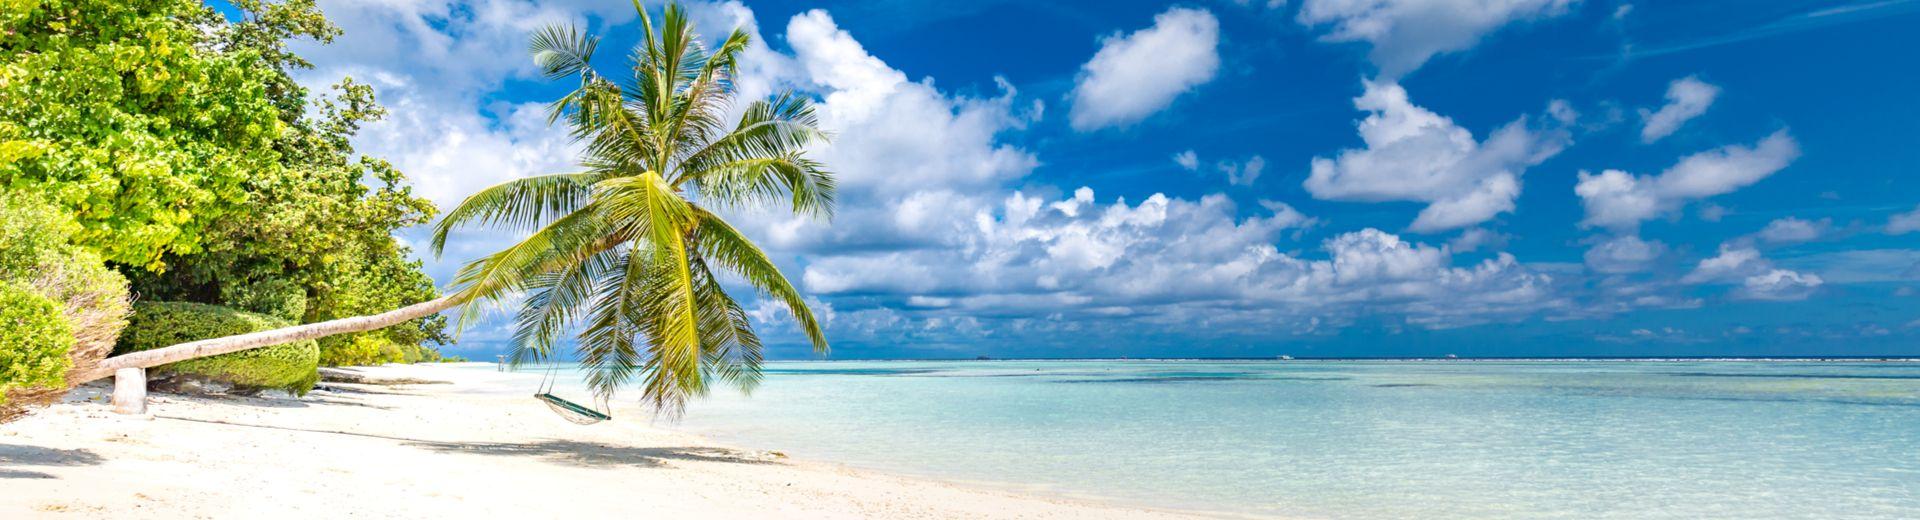 AIDAperla: Im Januar die Karibik entdecken